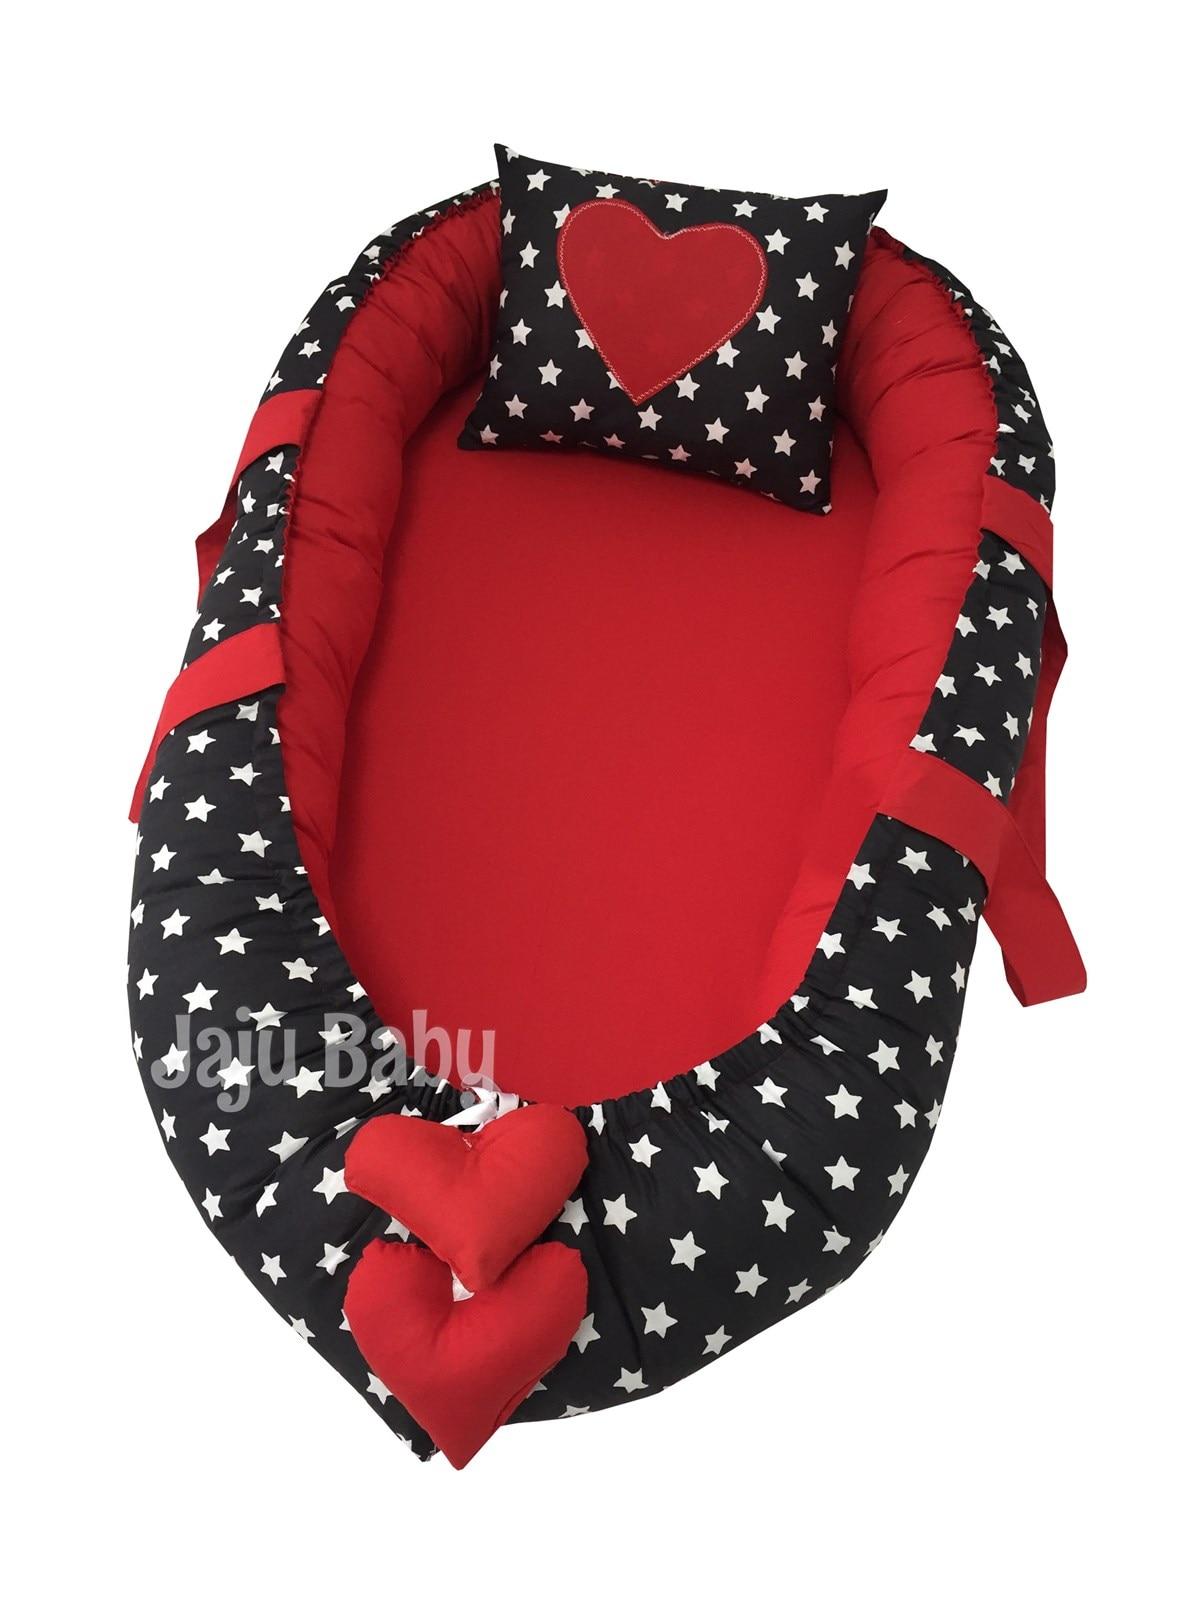 Jaju Baby Special Handmade Black Star Red Luxury Design Babynest